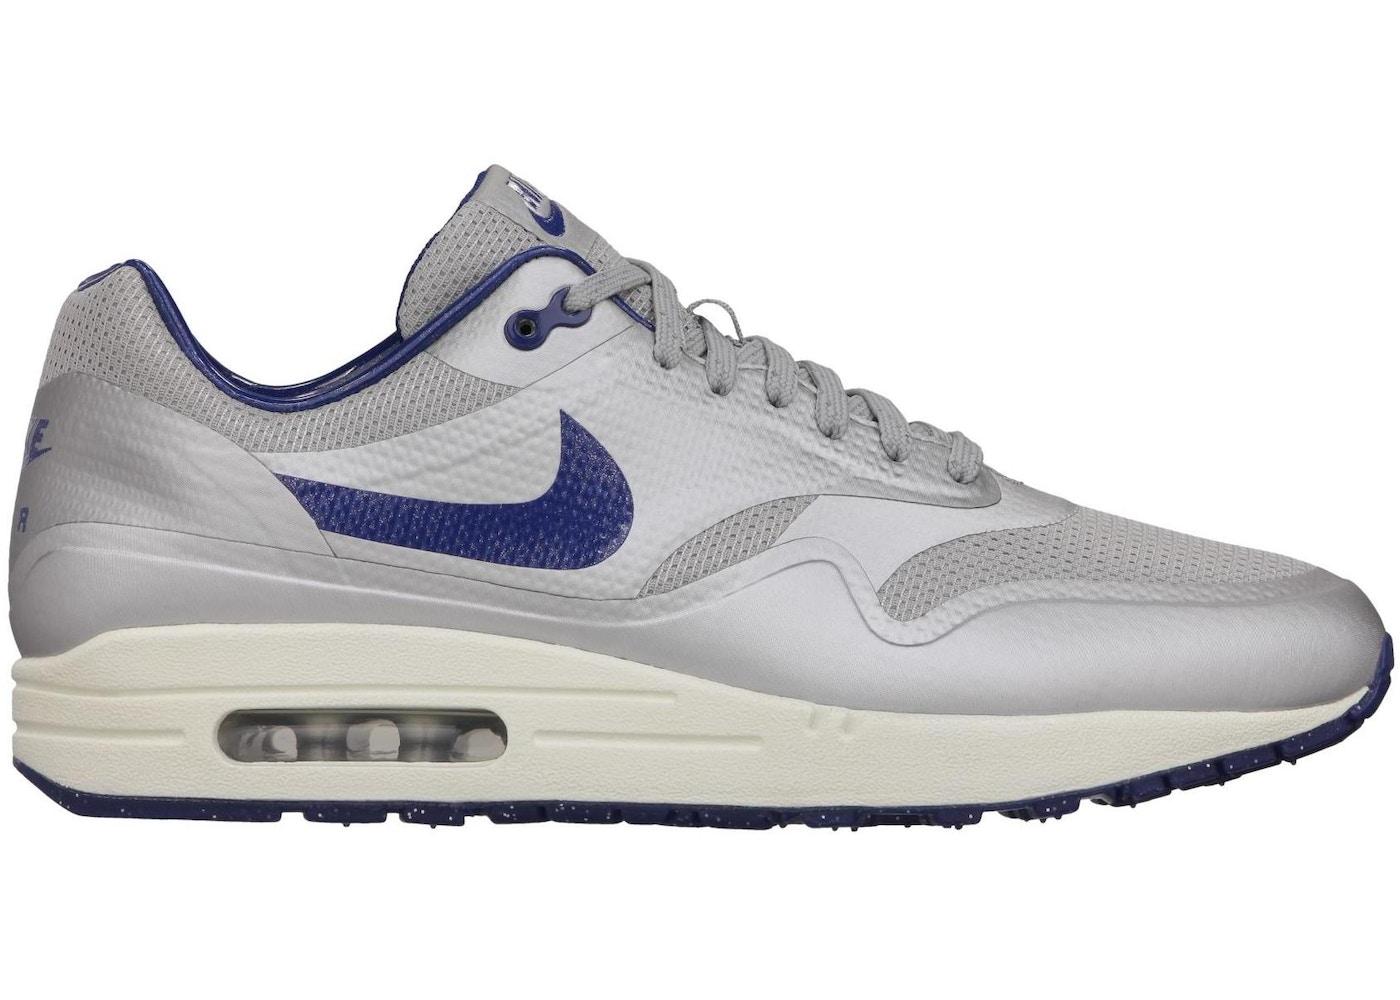 fecha límite Masacre boleto  Nike Air Max 1 Night Track Royal - 633087-004